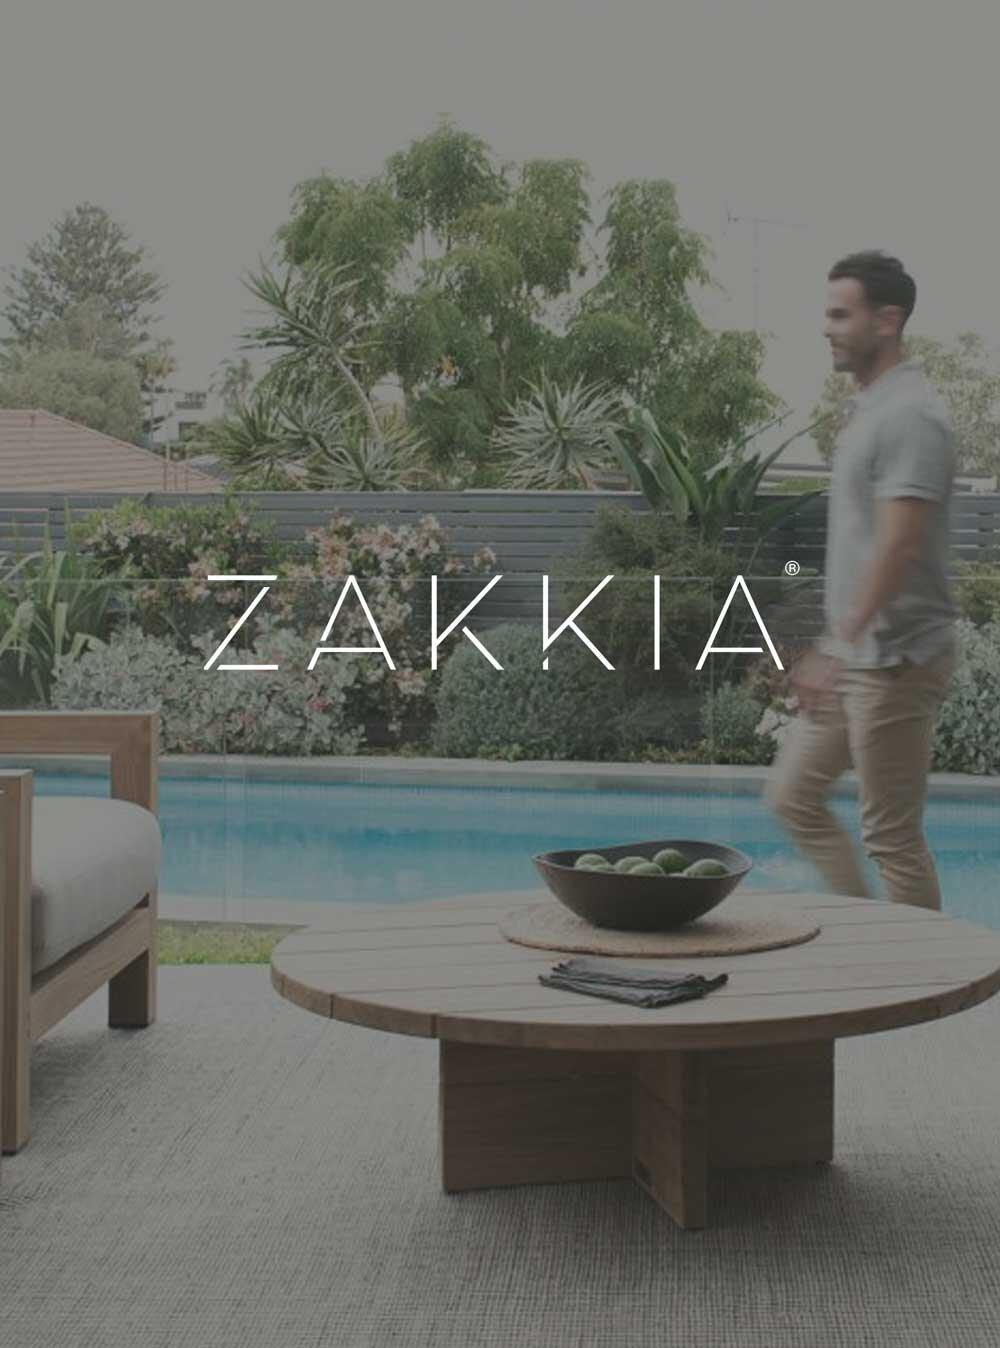 ZAKKIA - 'Adam Robinson Design'Sept, 2019